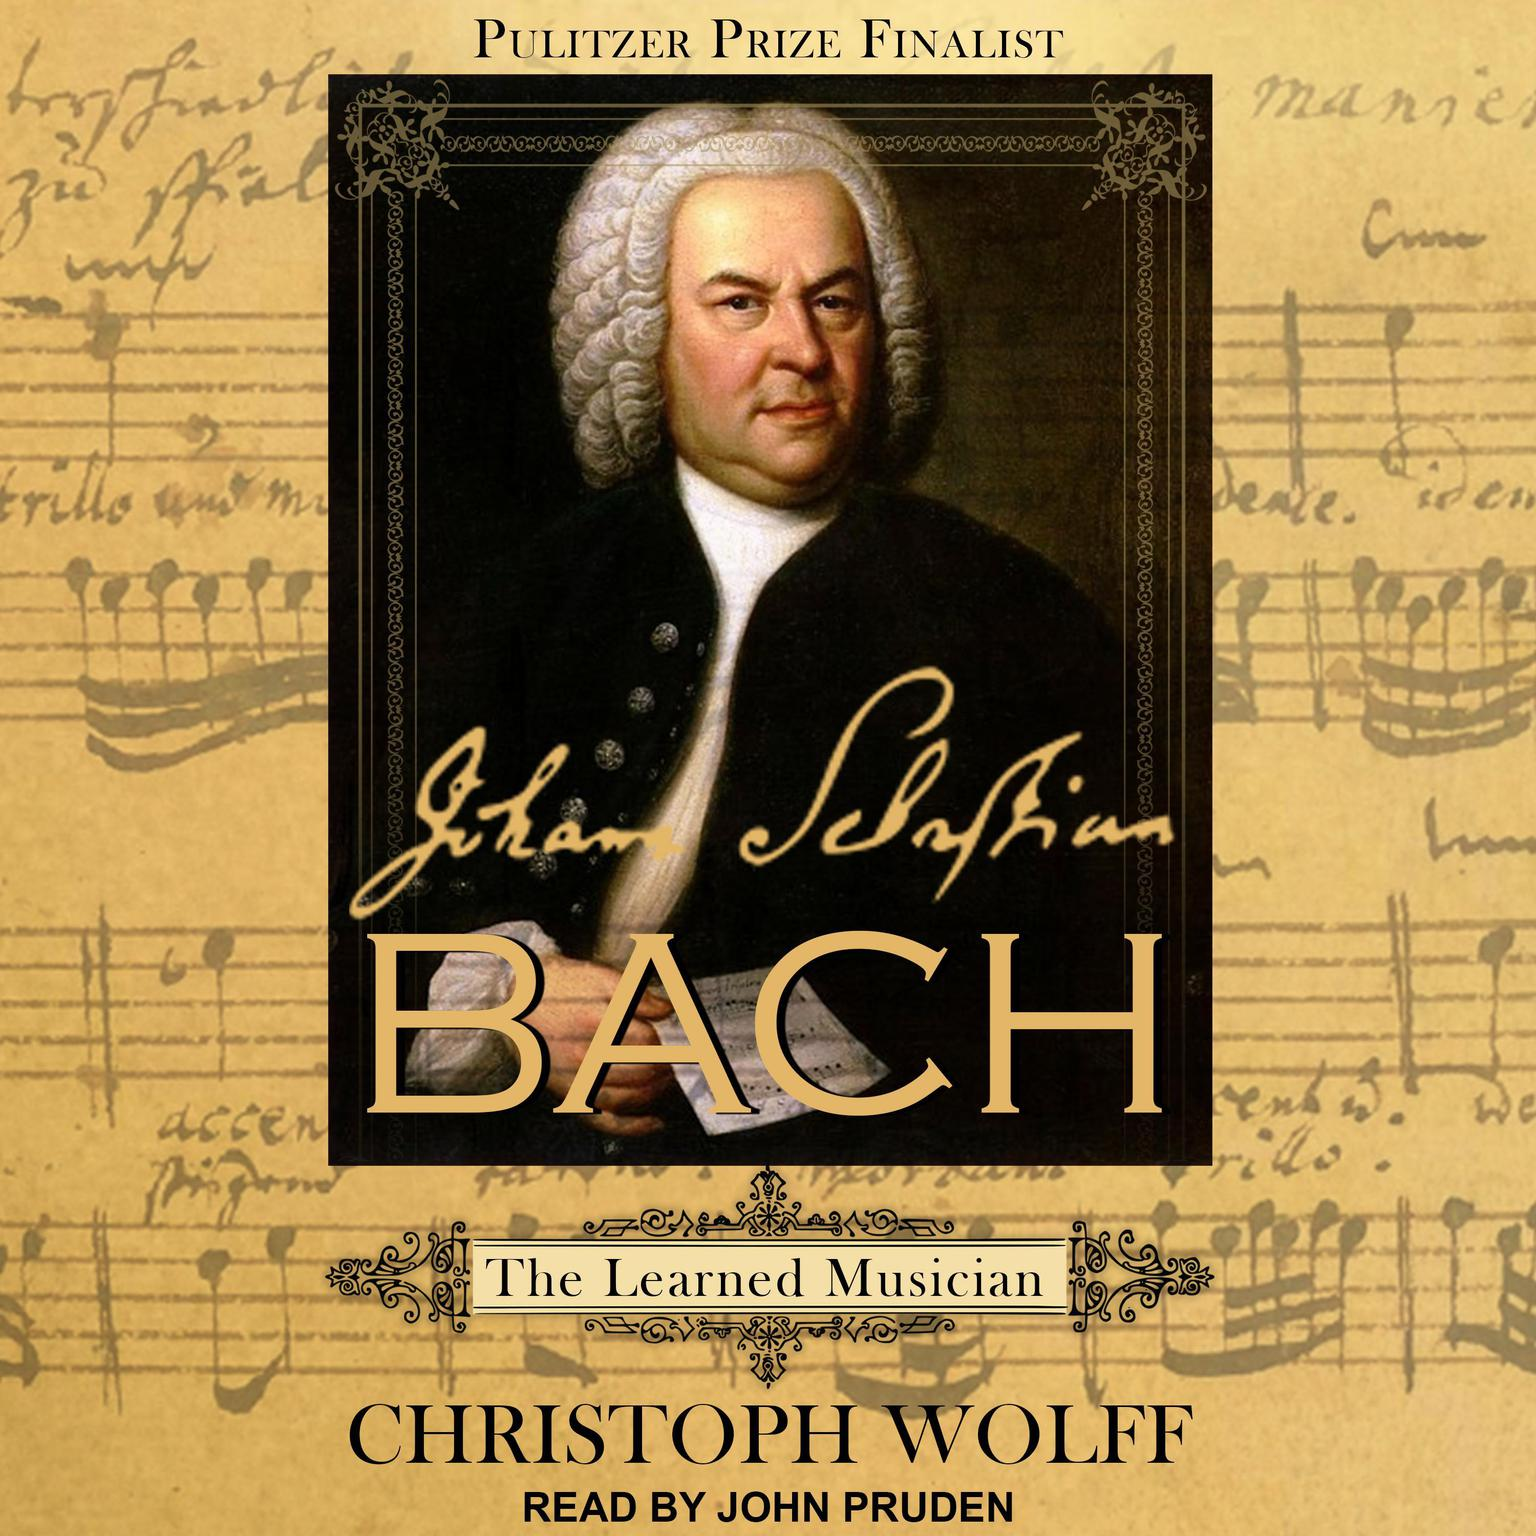 Johann Sebastian Bach: The Learned Musician Audiobook, by Christoph Wolff